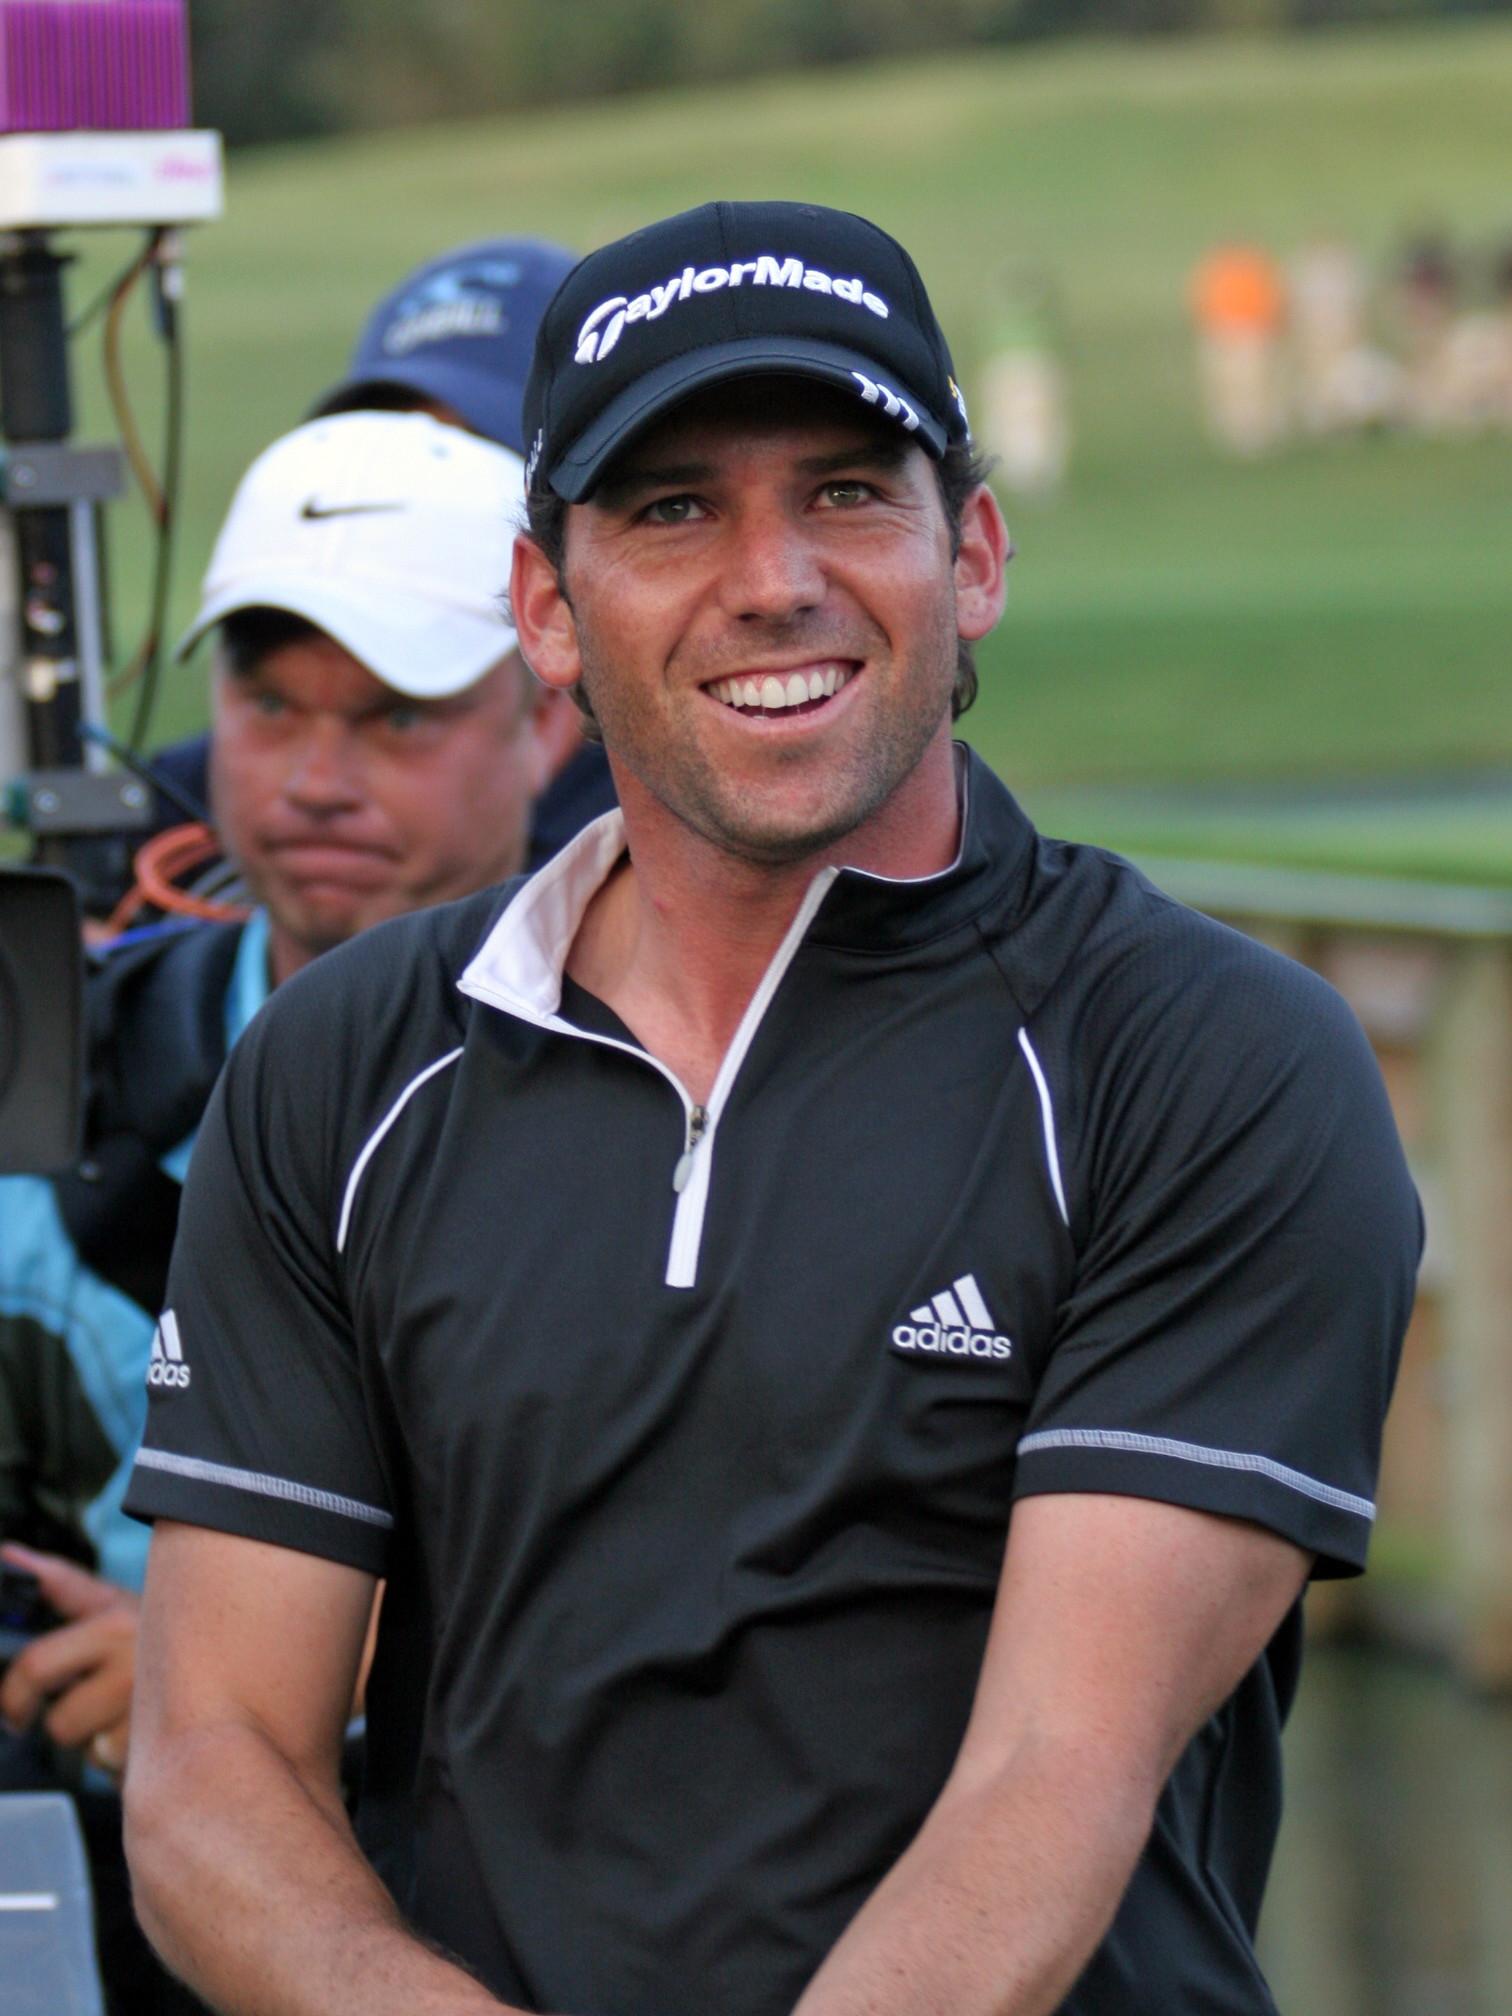 Sergio Garcia (golfista)